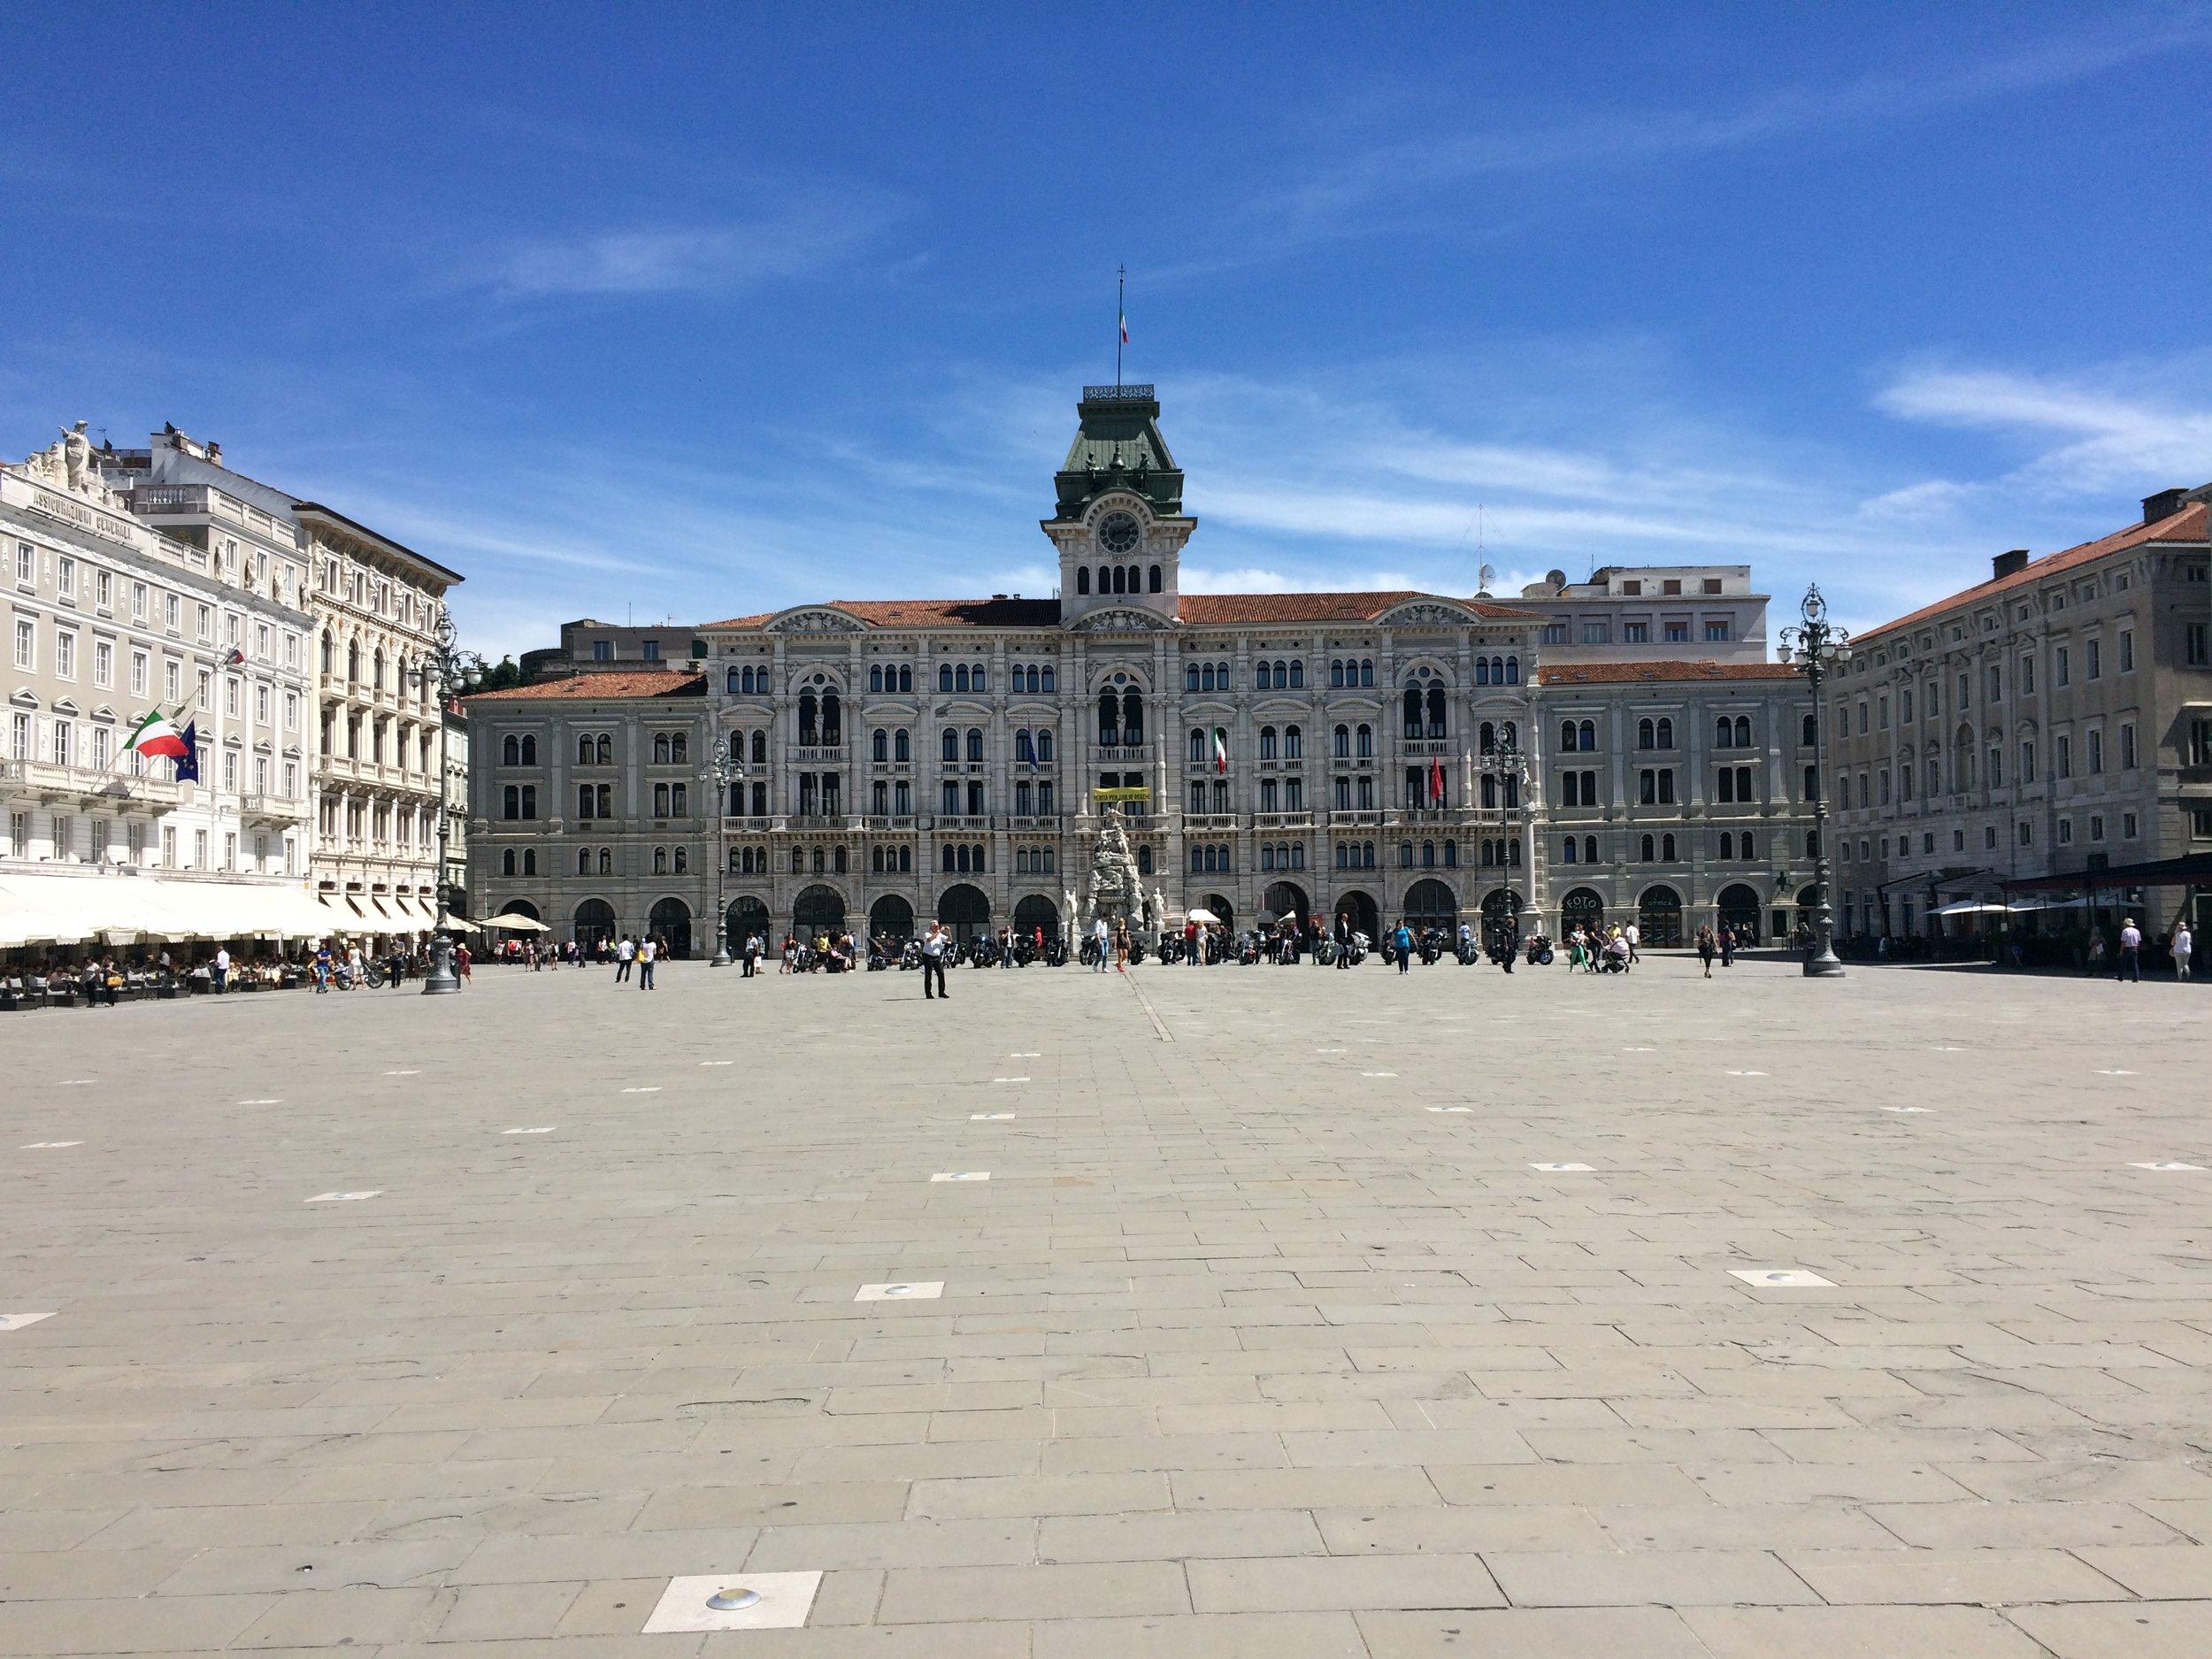 Main square Piazza Unita d'Italia